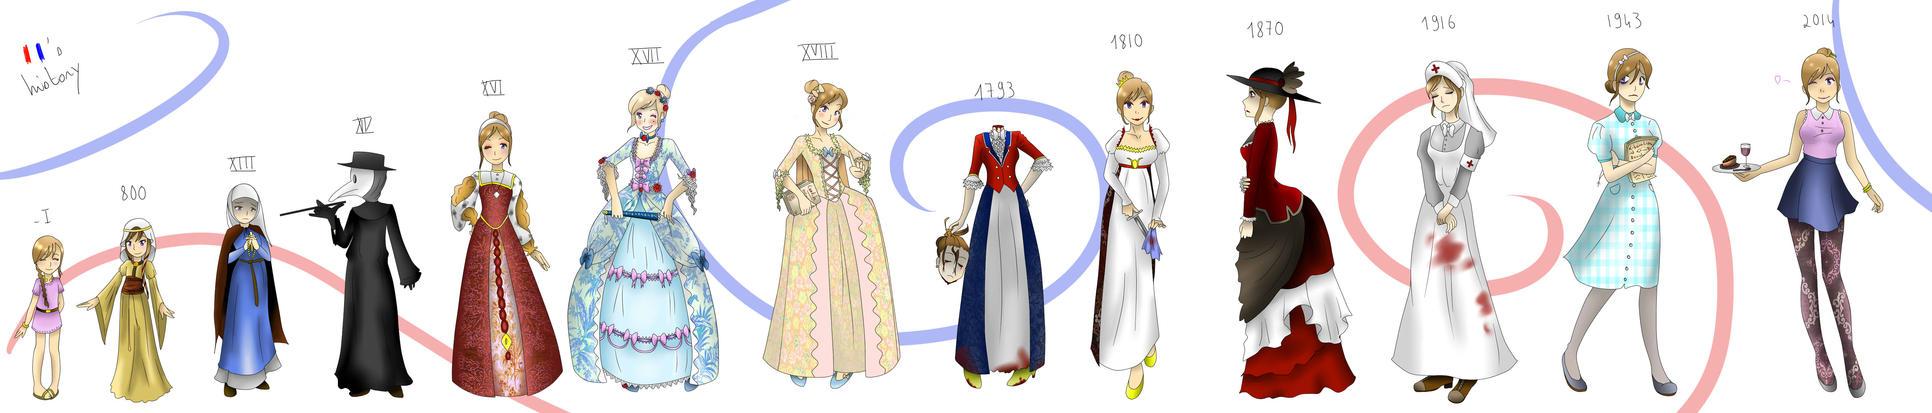 NyoFrance's History by Chisei-sensei